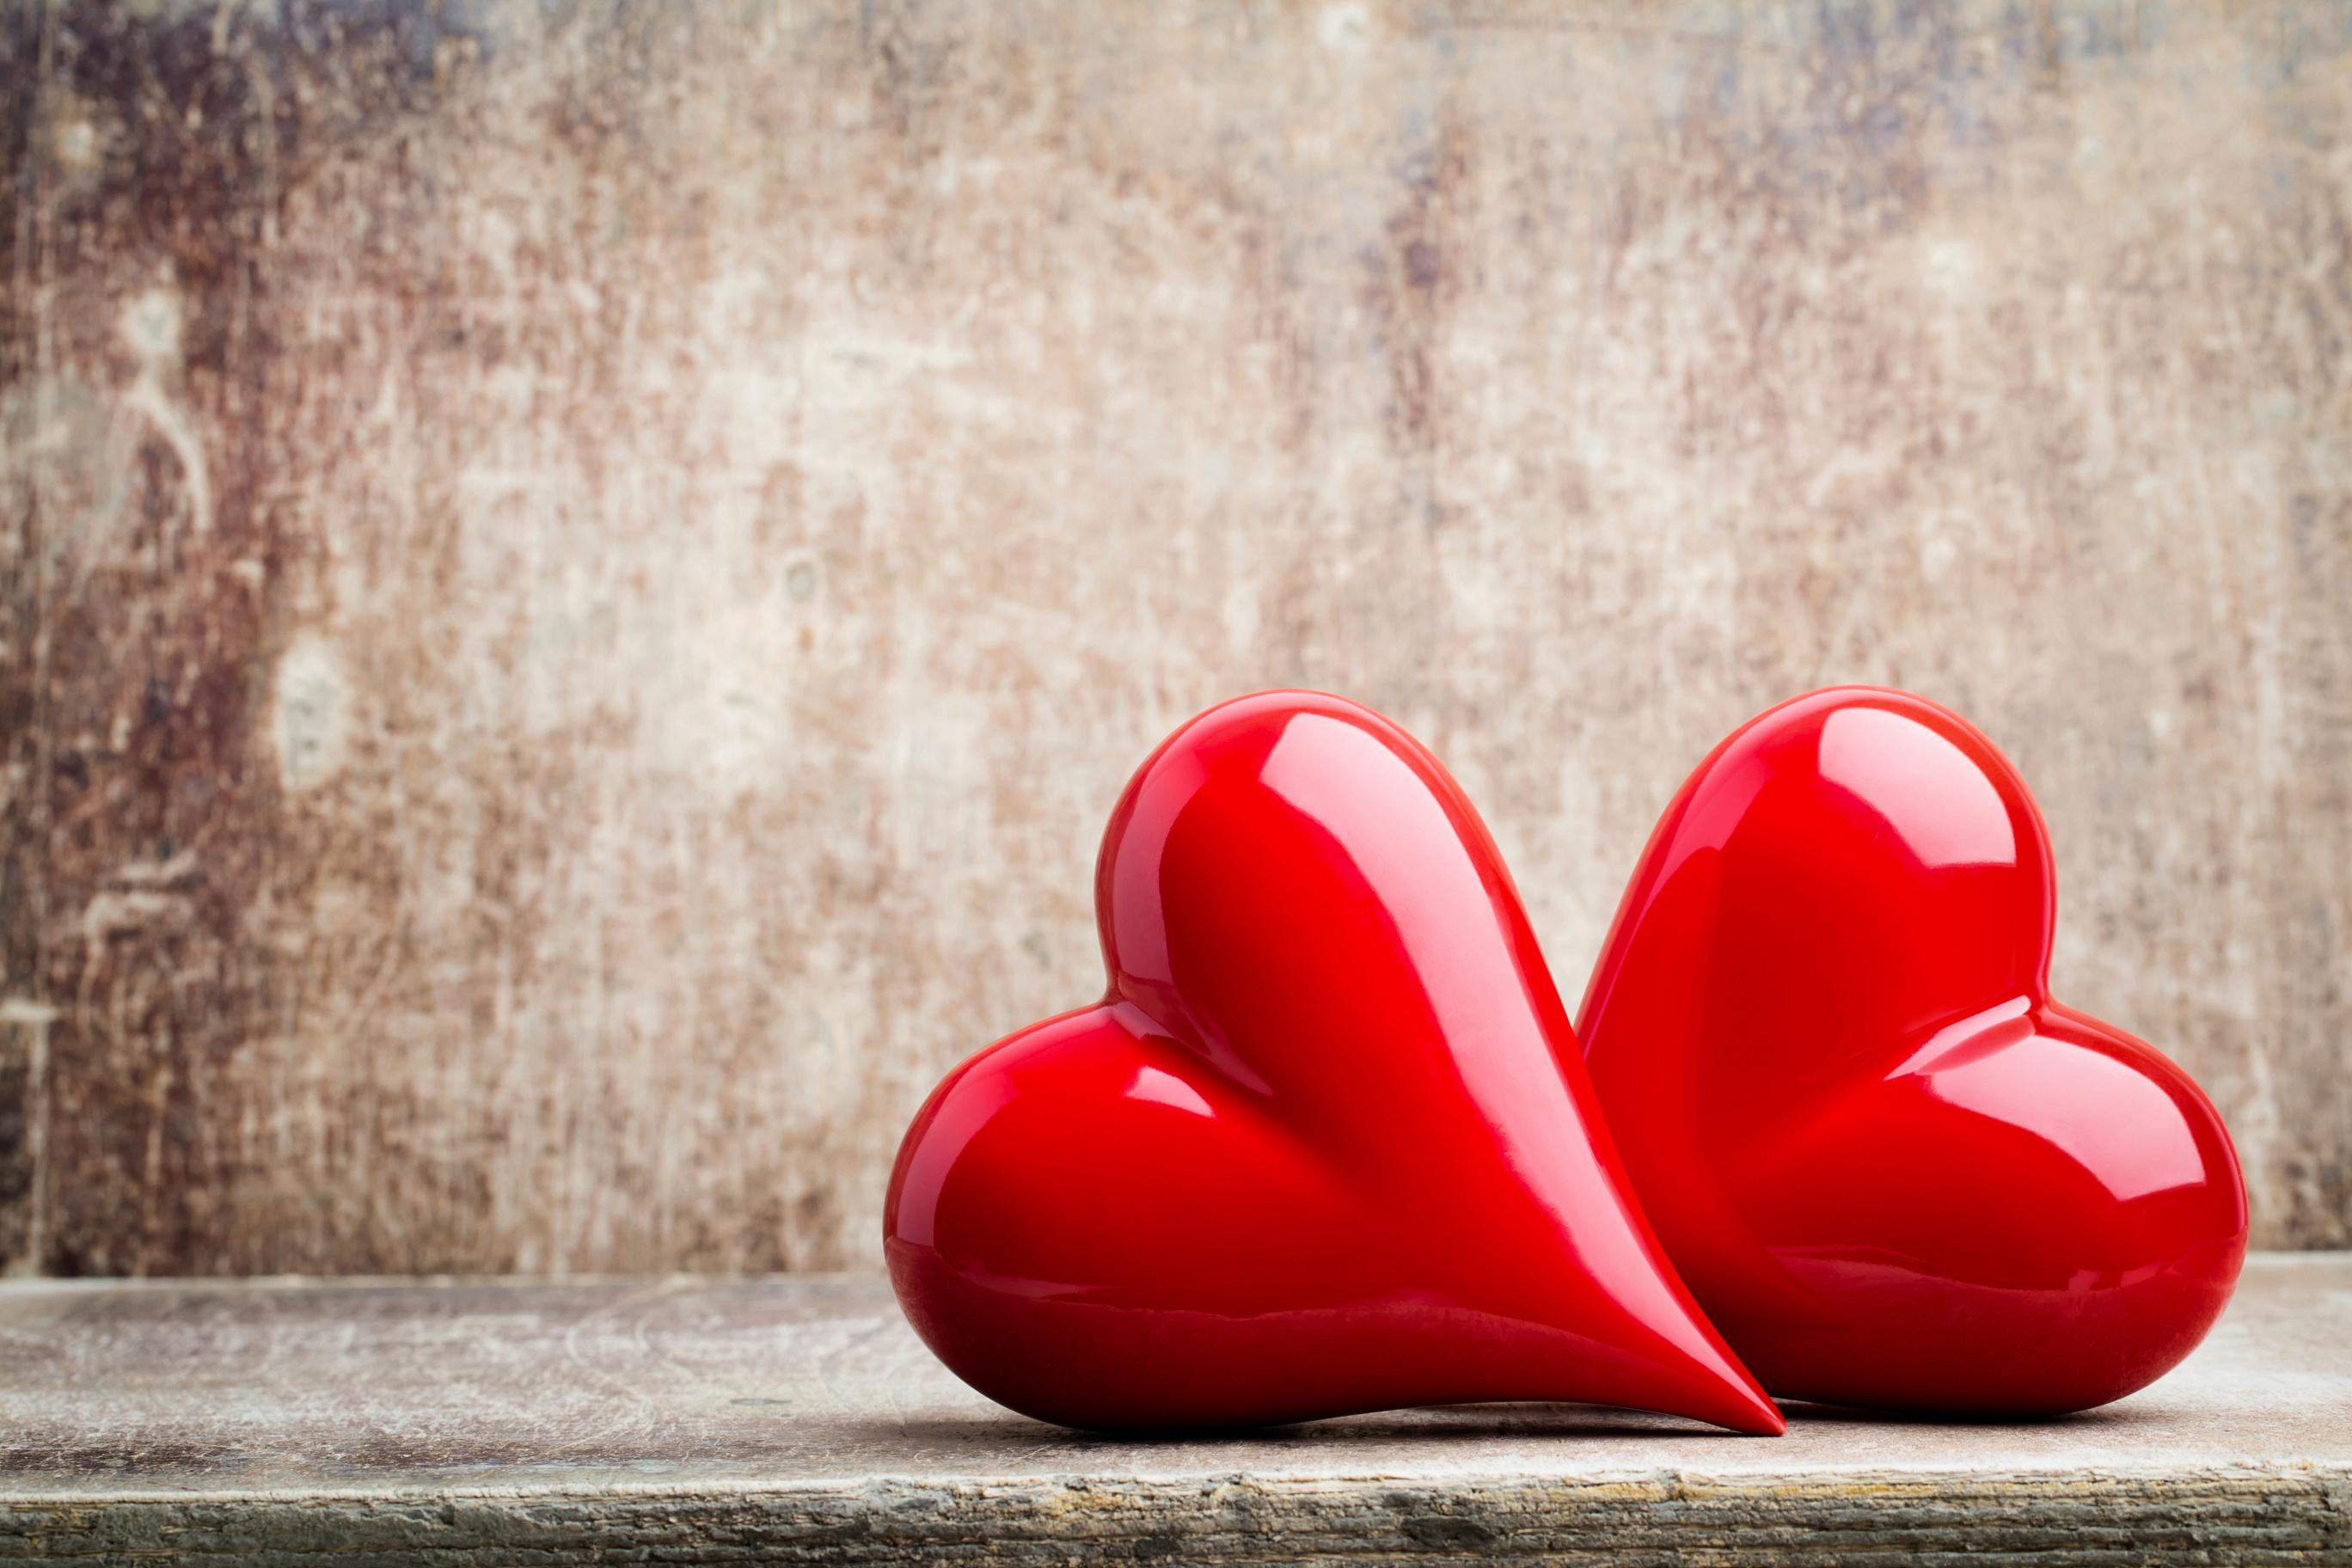 Картинки любви сердечки и картинки с сердечками